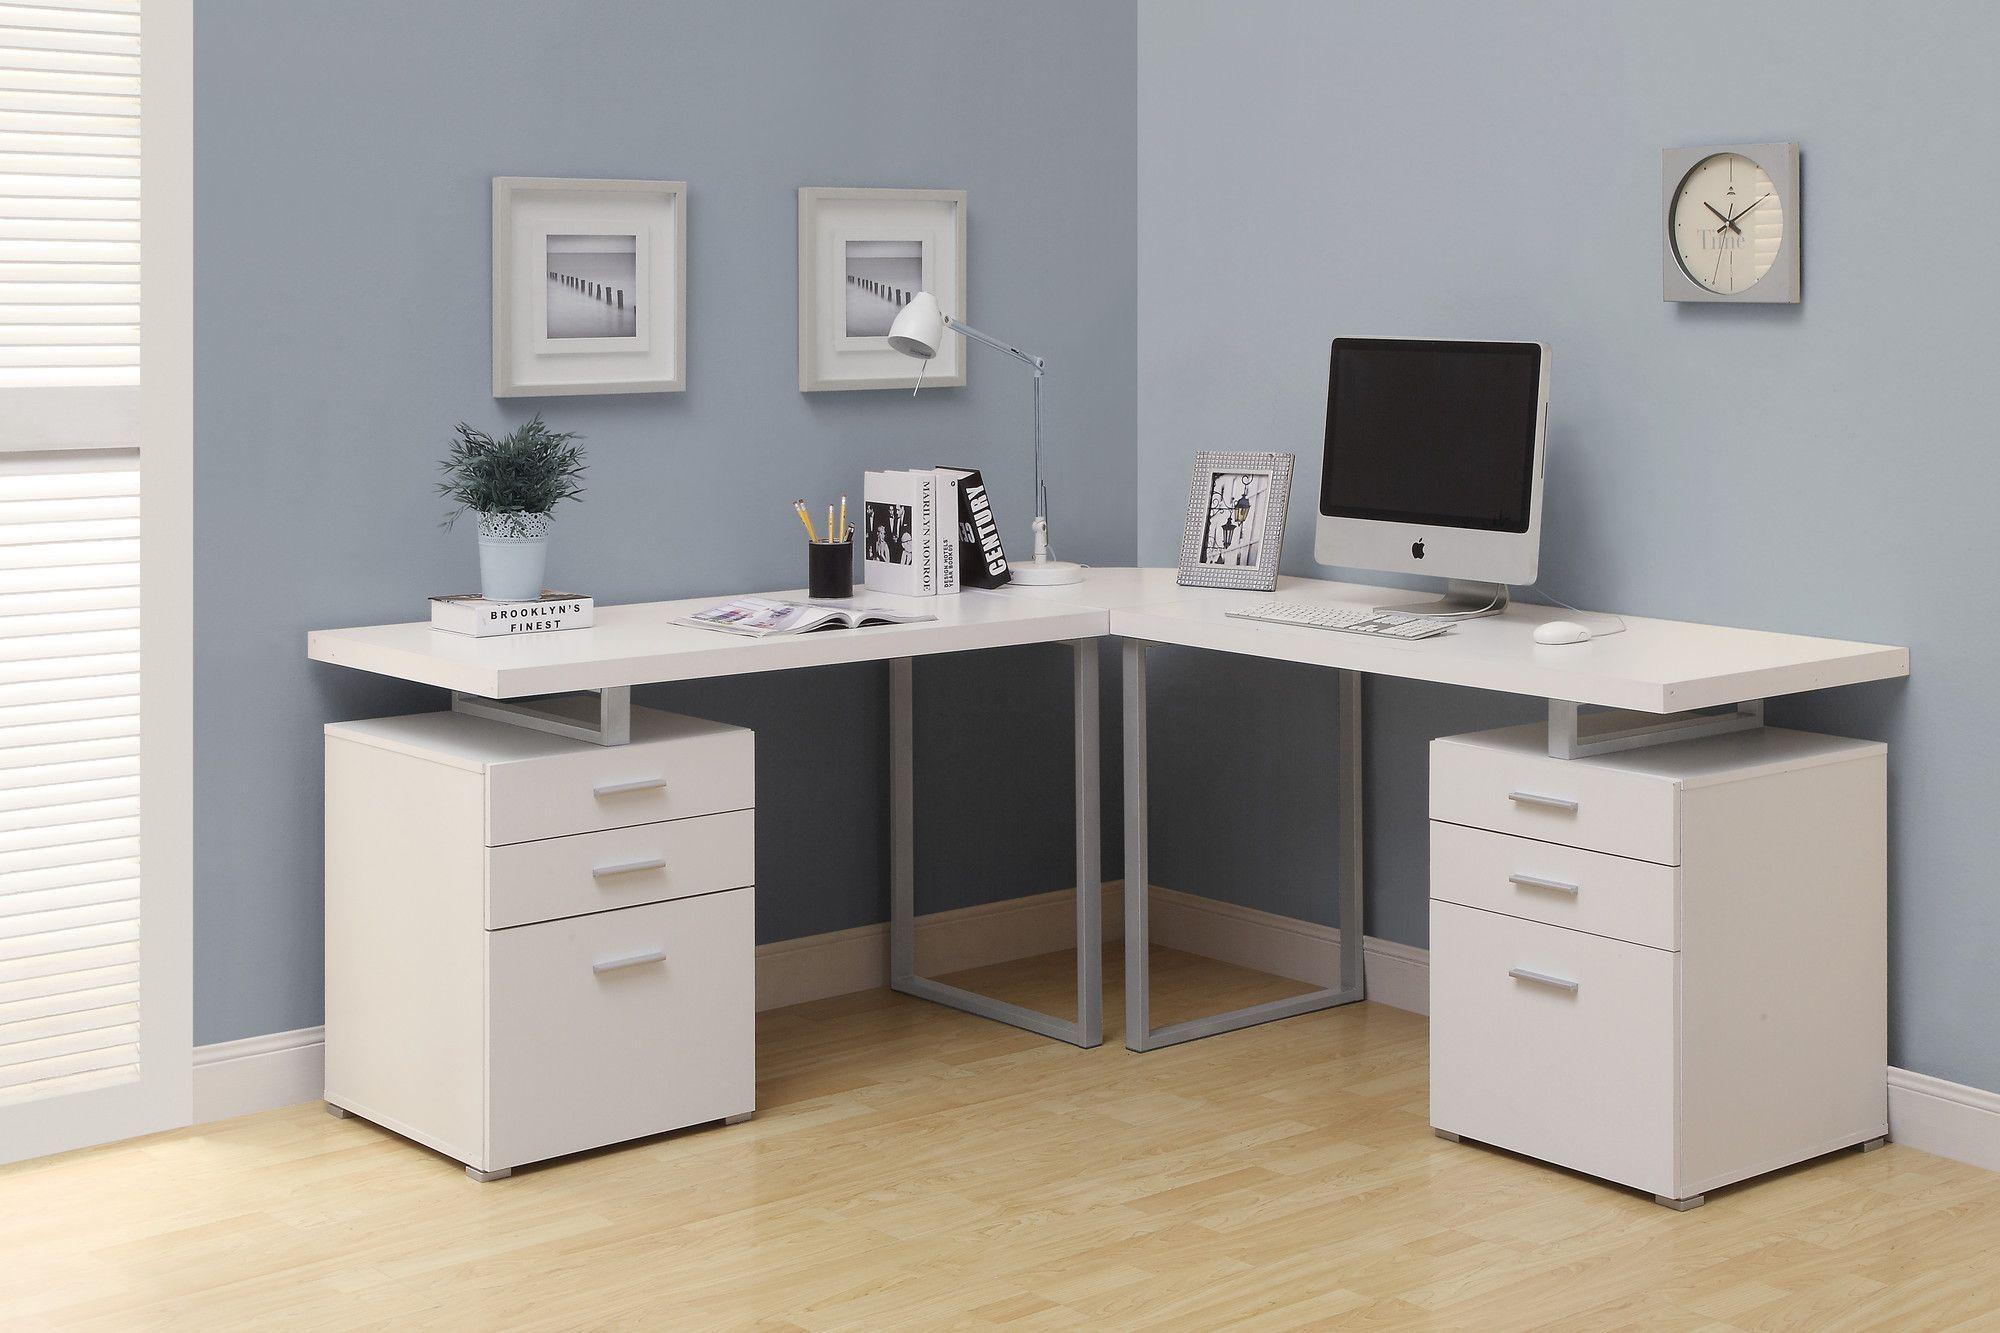 Computer Desk With 6 Drawers White Corner Desk Home Office Design White Desk Office